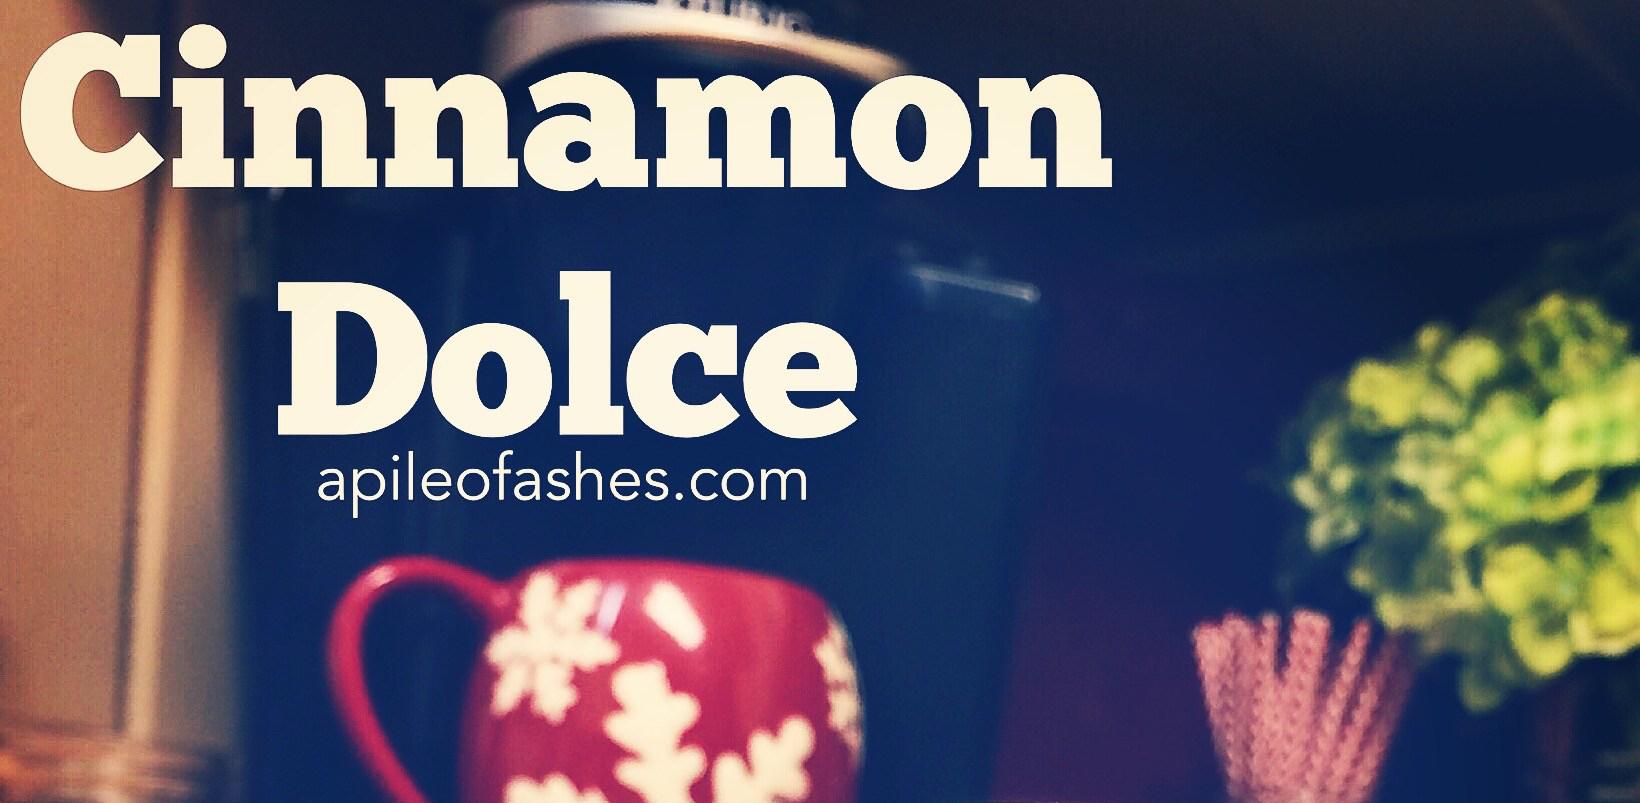 Cinnamon Dolce | apilefoashes.com